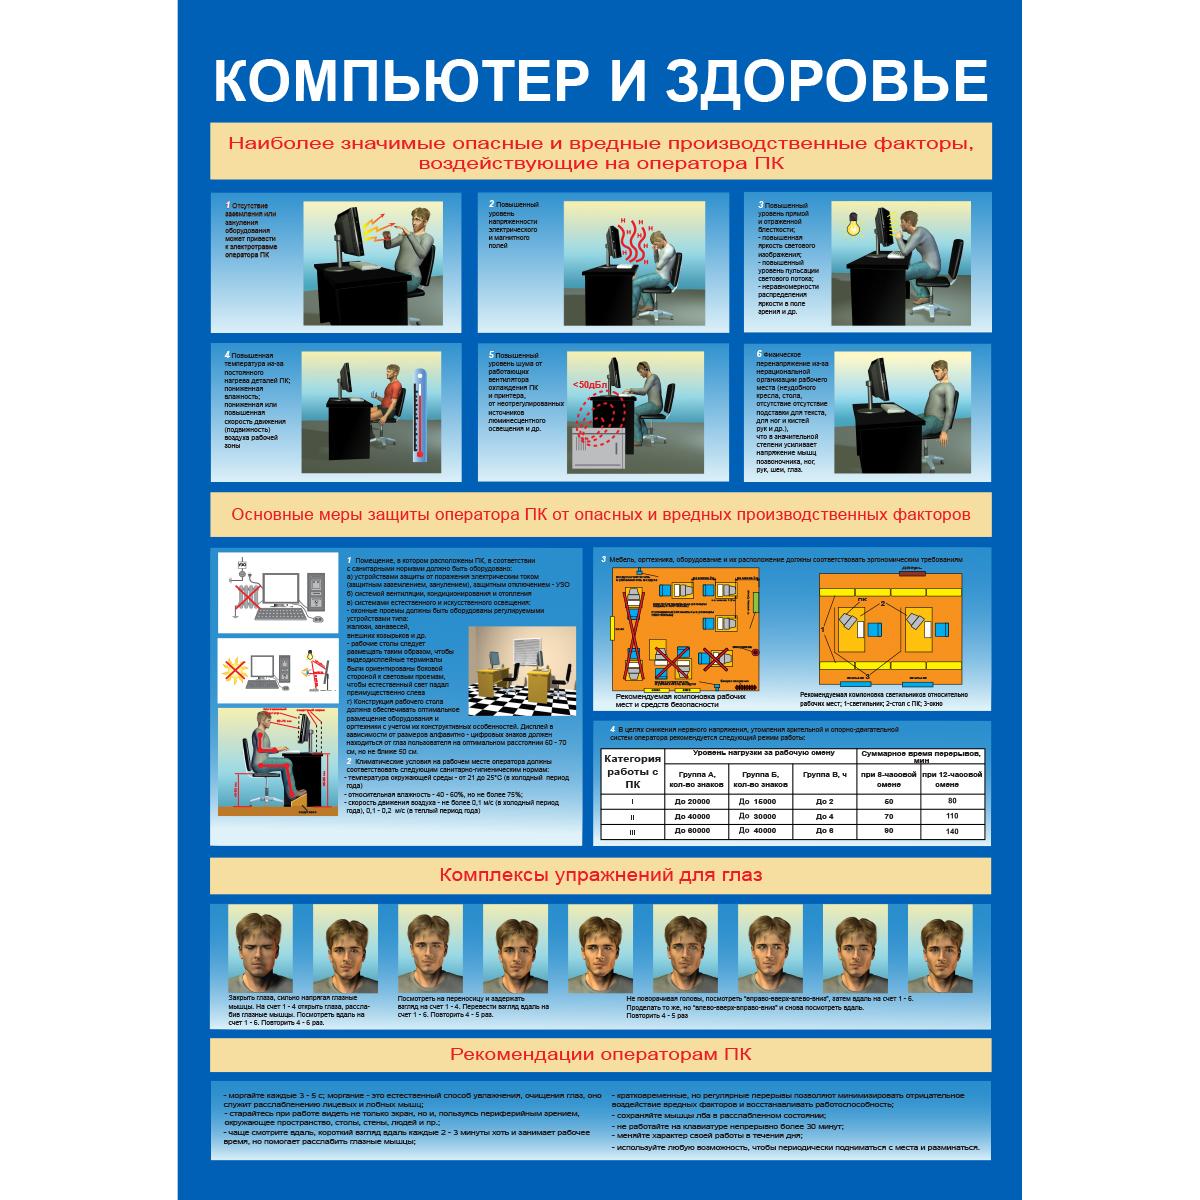 Компьютер и безопасность  1000х700 мм